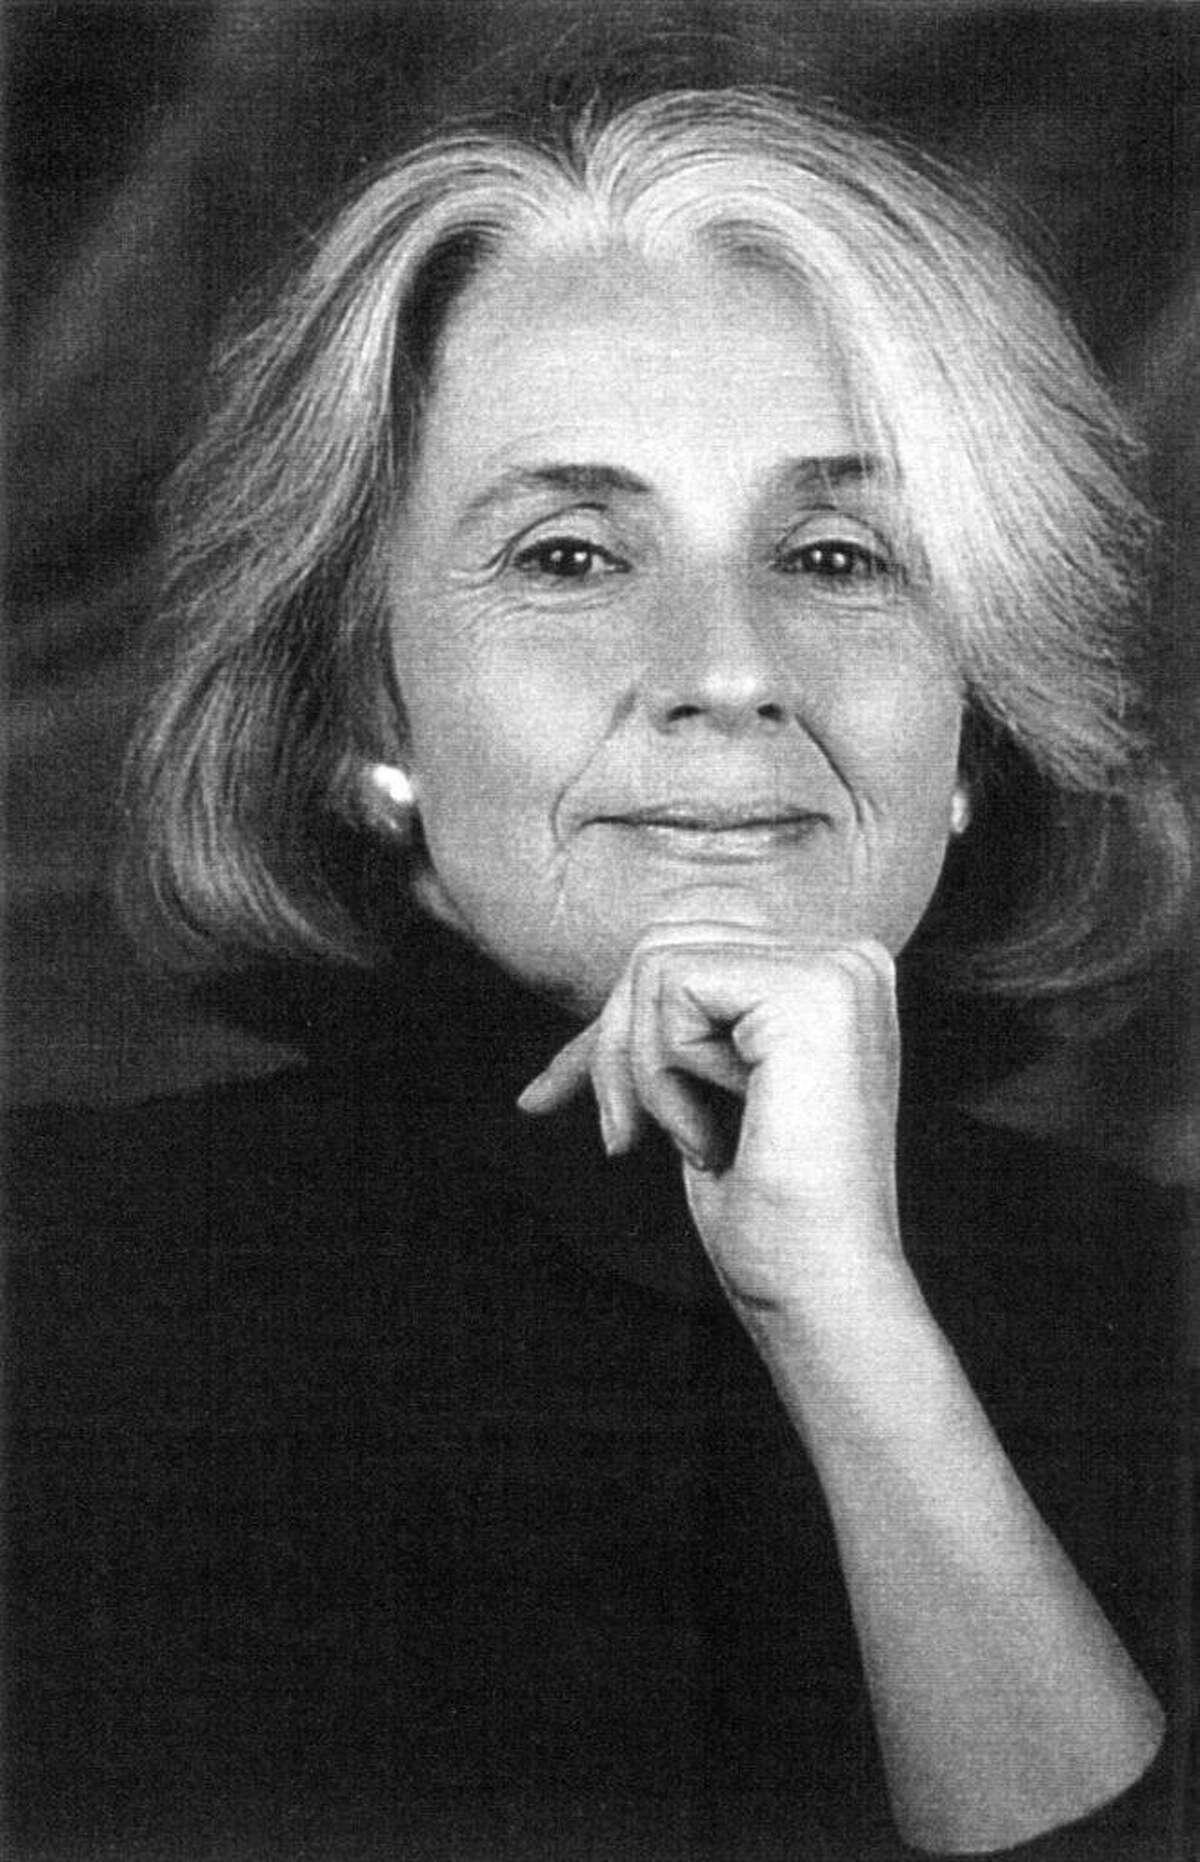 Poet Susan Kinsolving will read at the Gunn Memorial Library, Washington, on June 23.